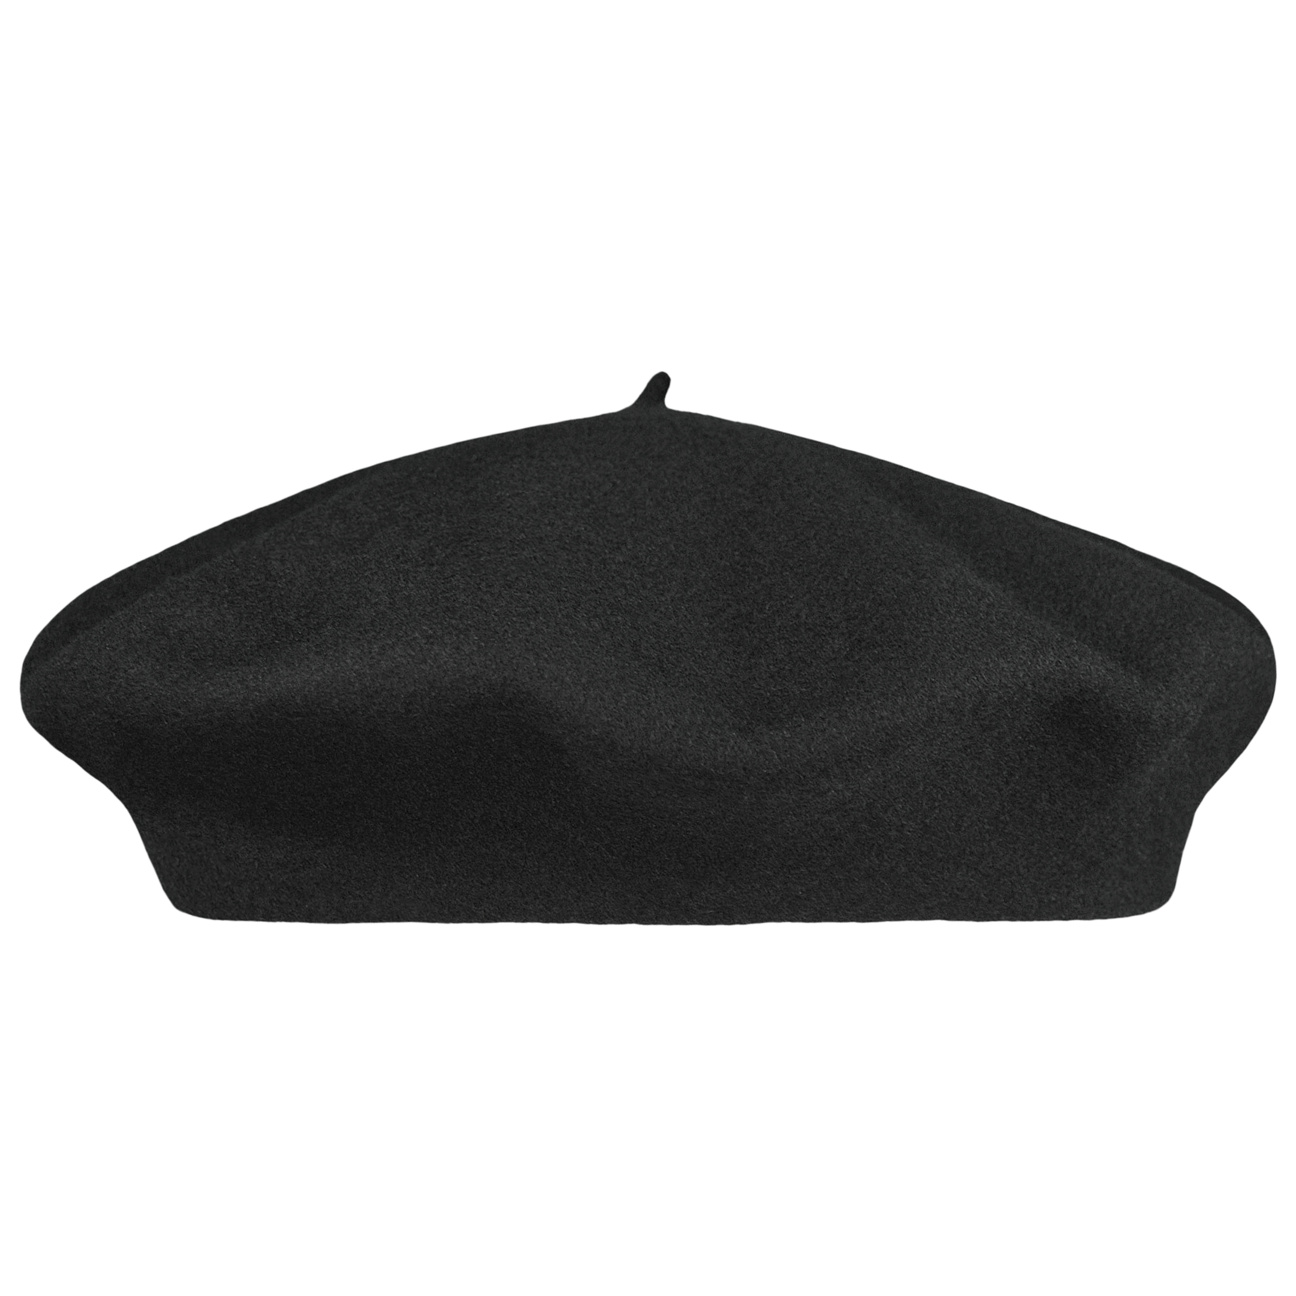 db230b2dc0ba5 Boina Vasca - Gorros - sombreroshop.es